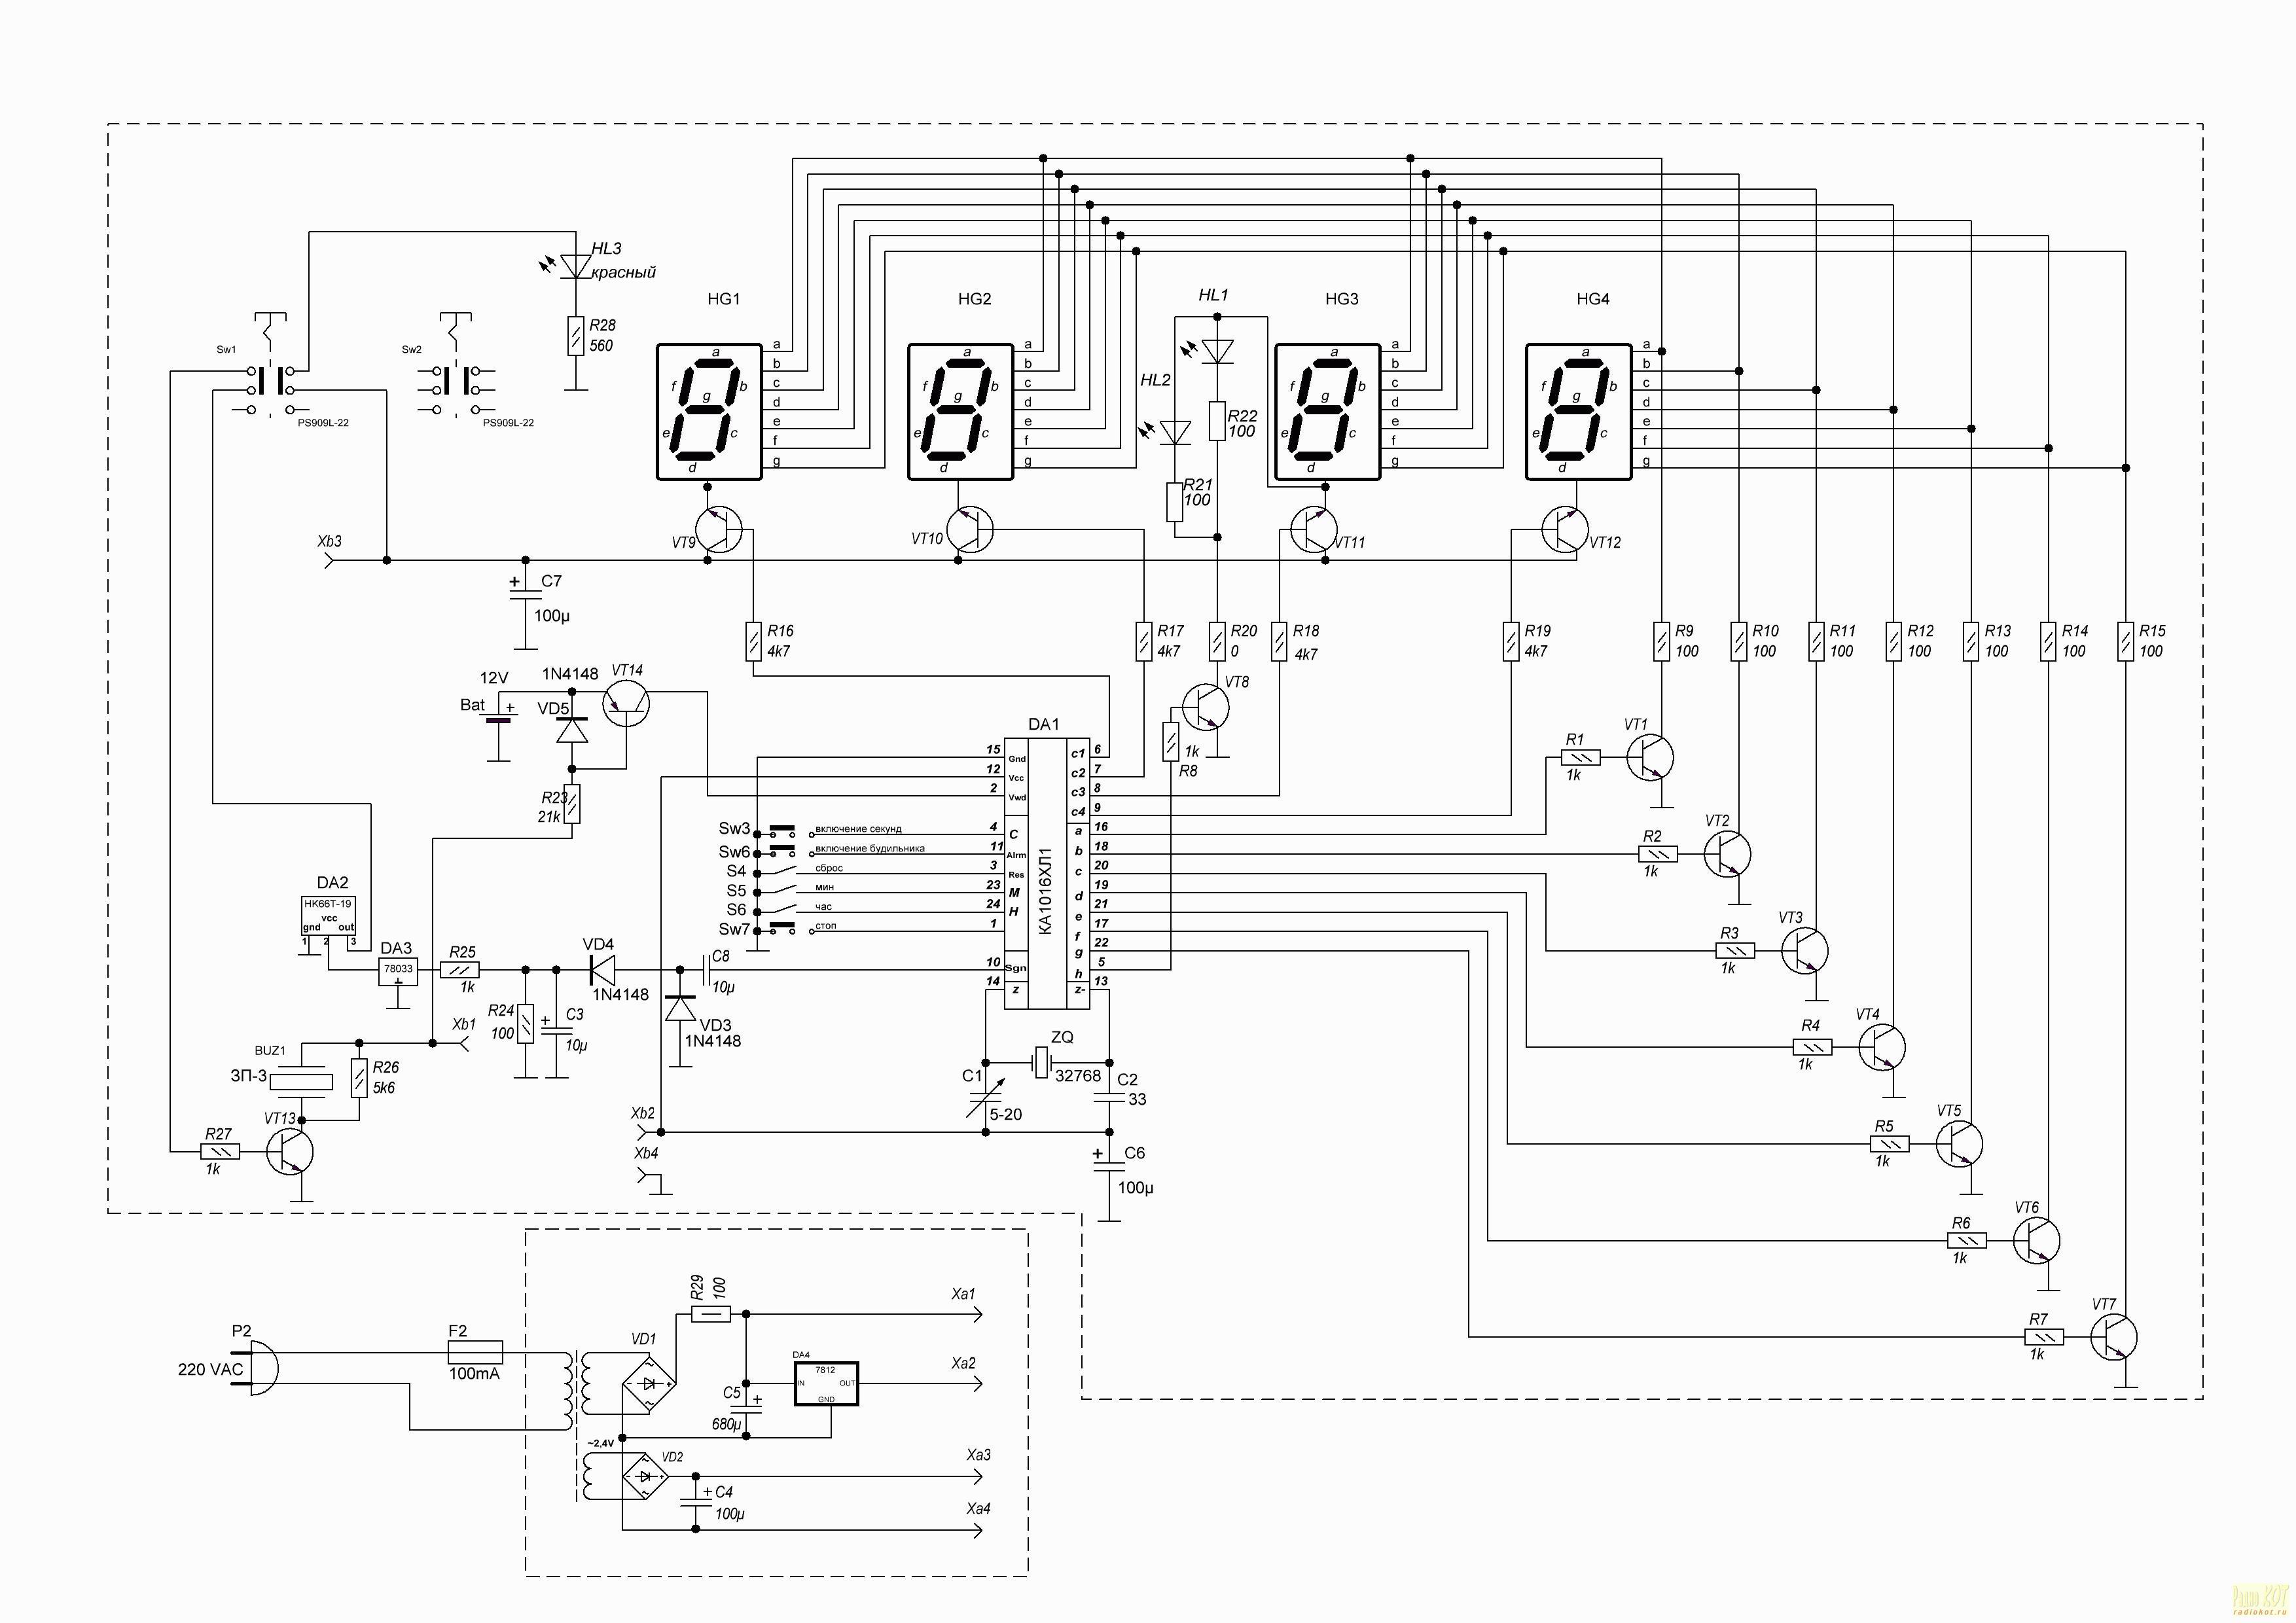 схема электронных часов» на ка1016хл1